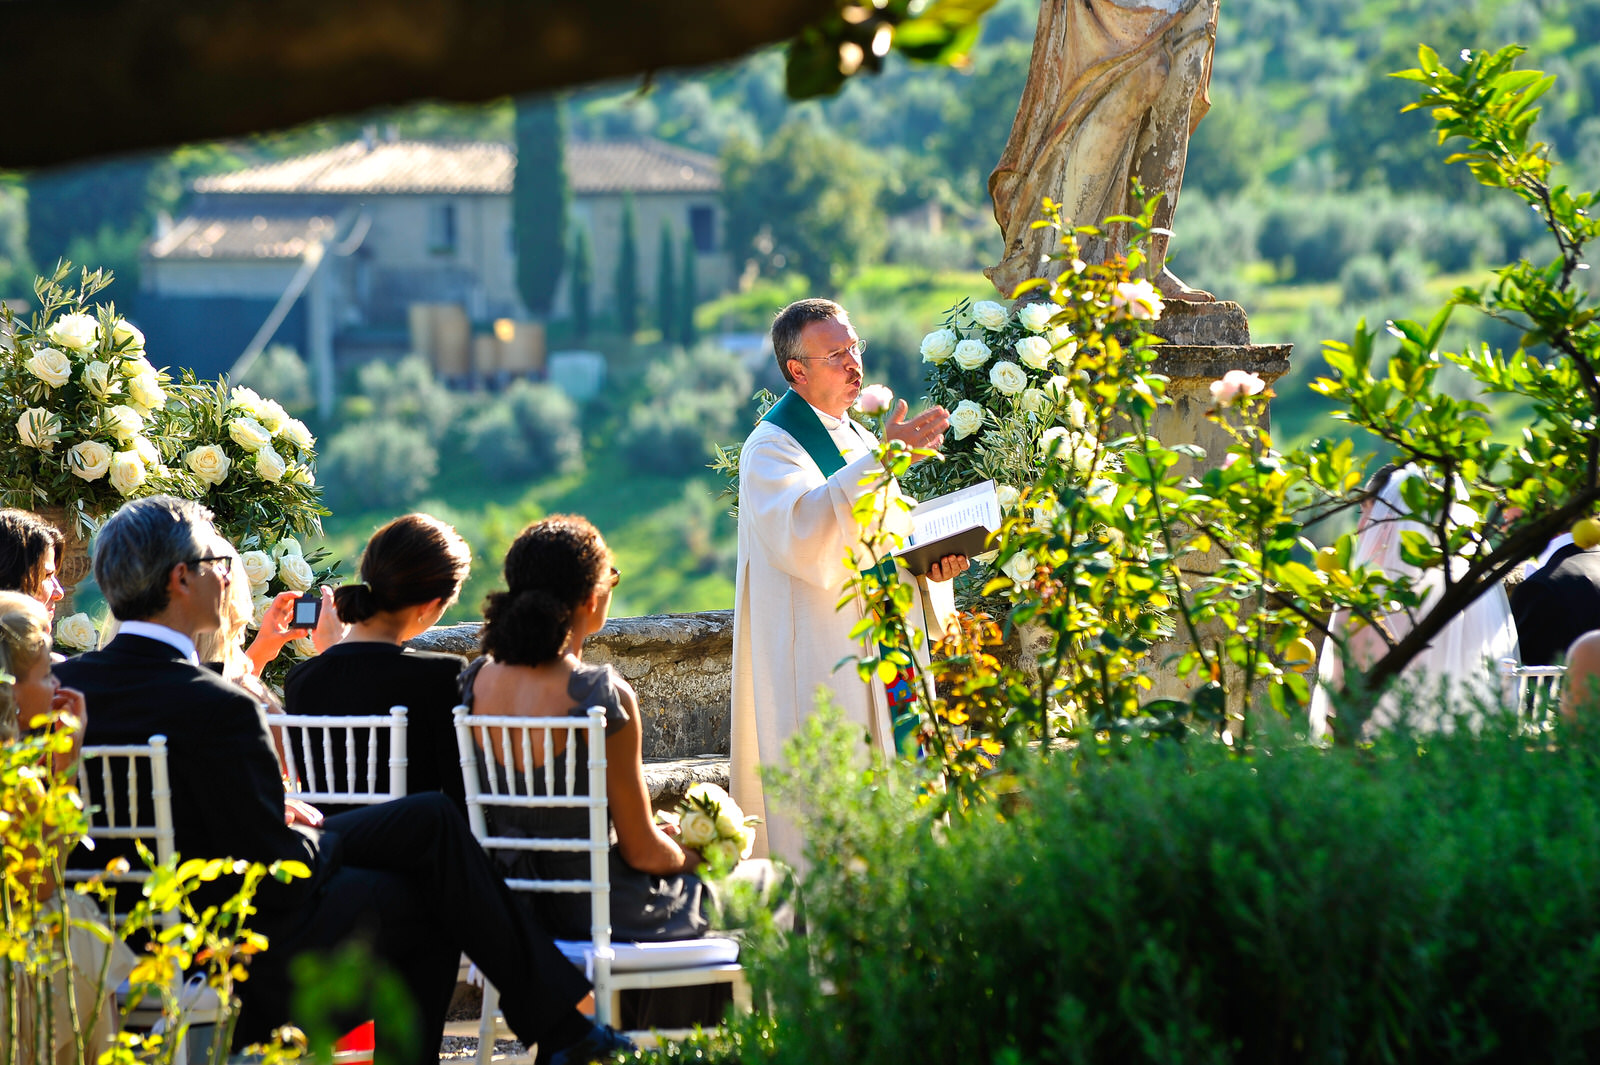 tuscany-wedding-planners-ceremonies-09.jpg